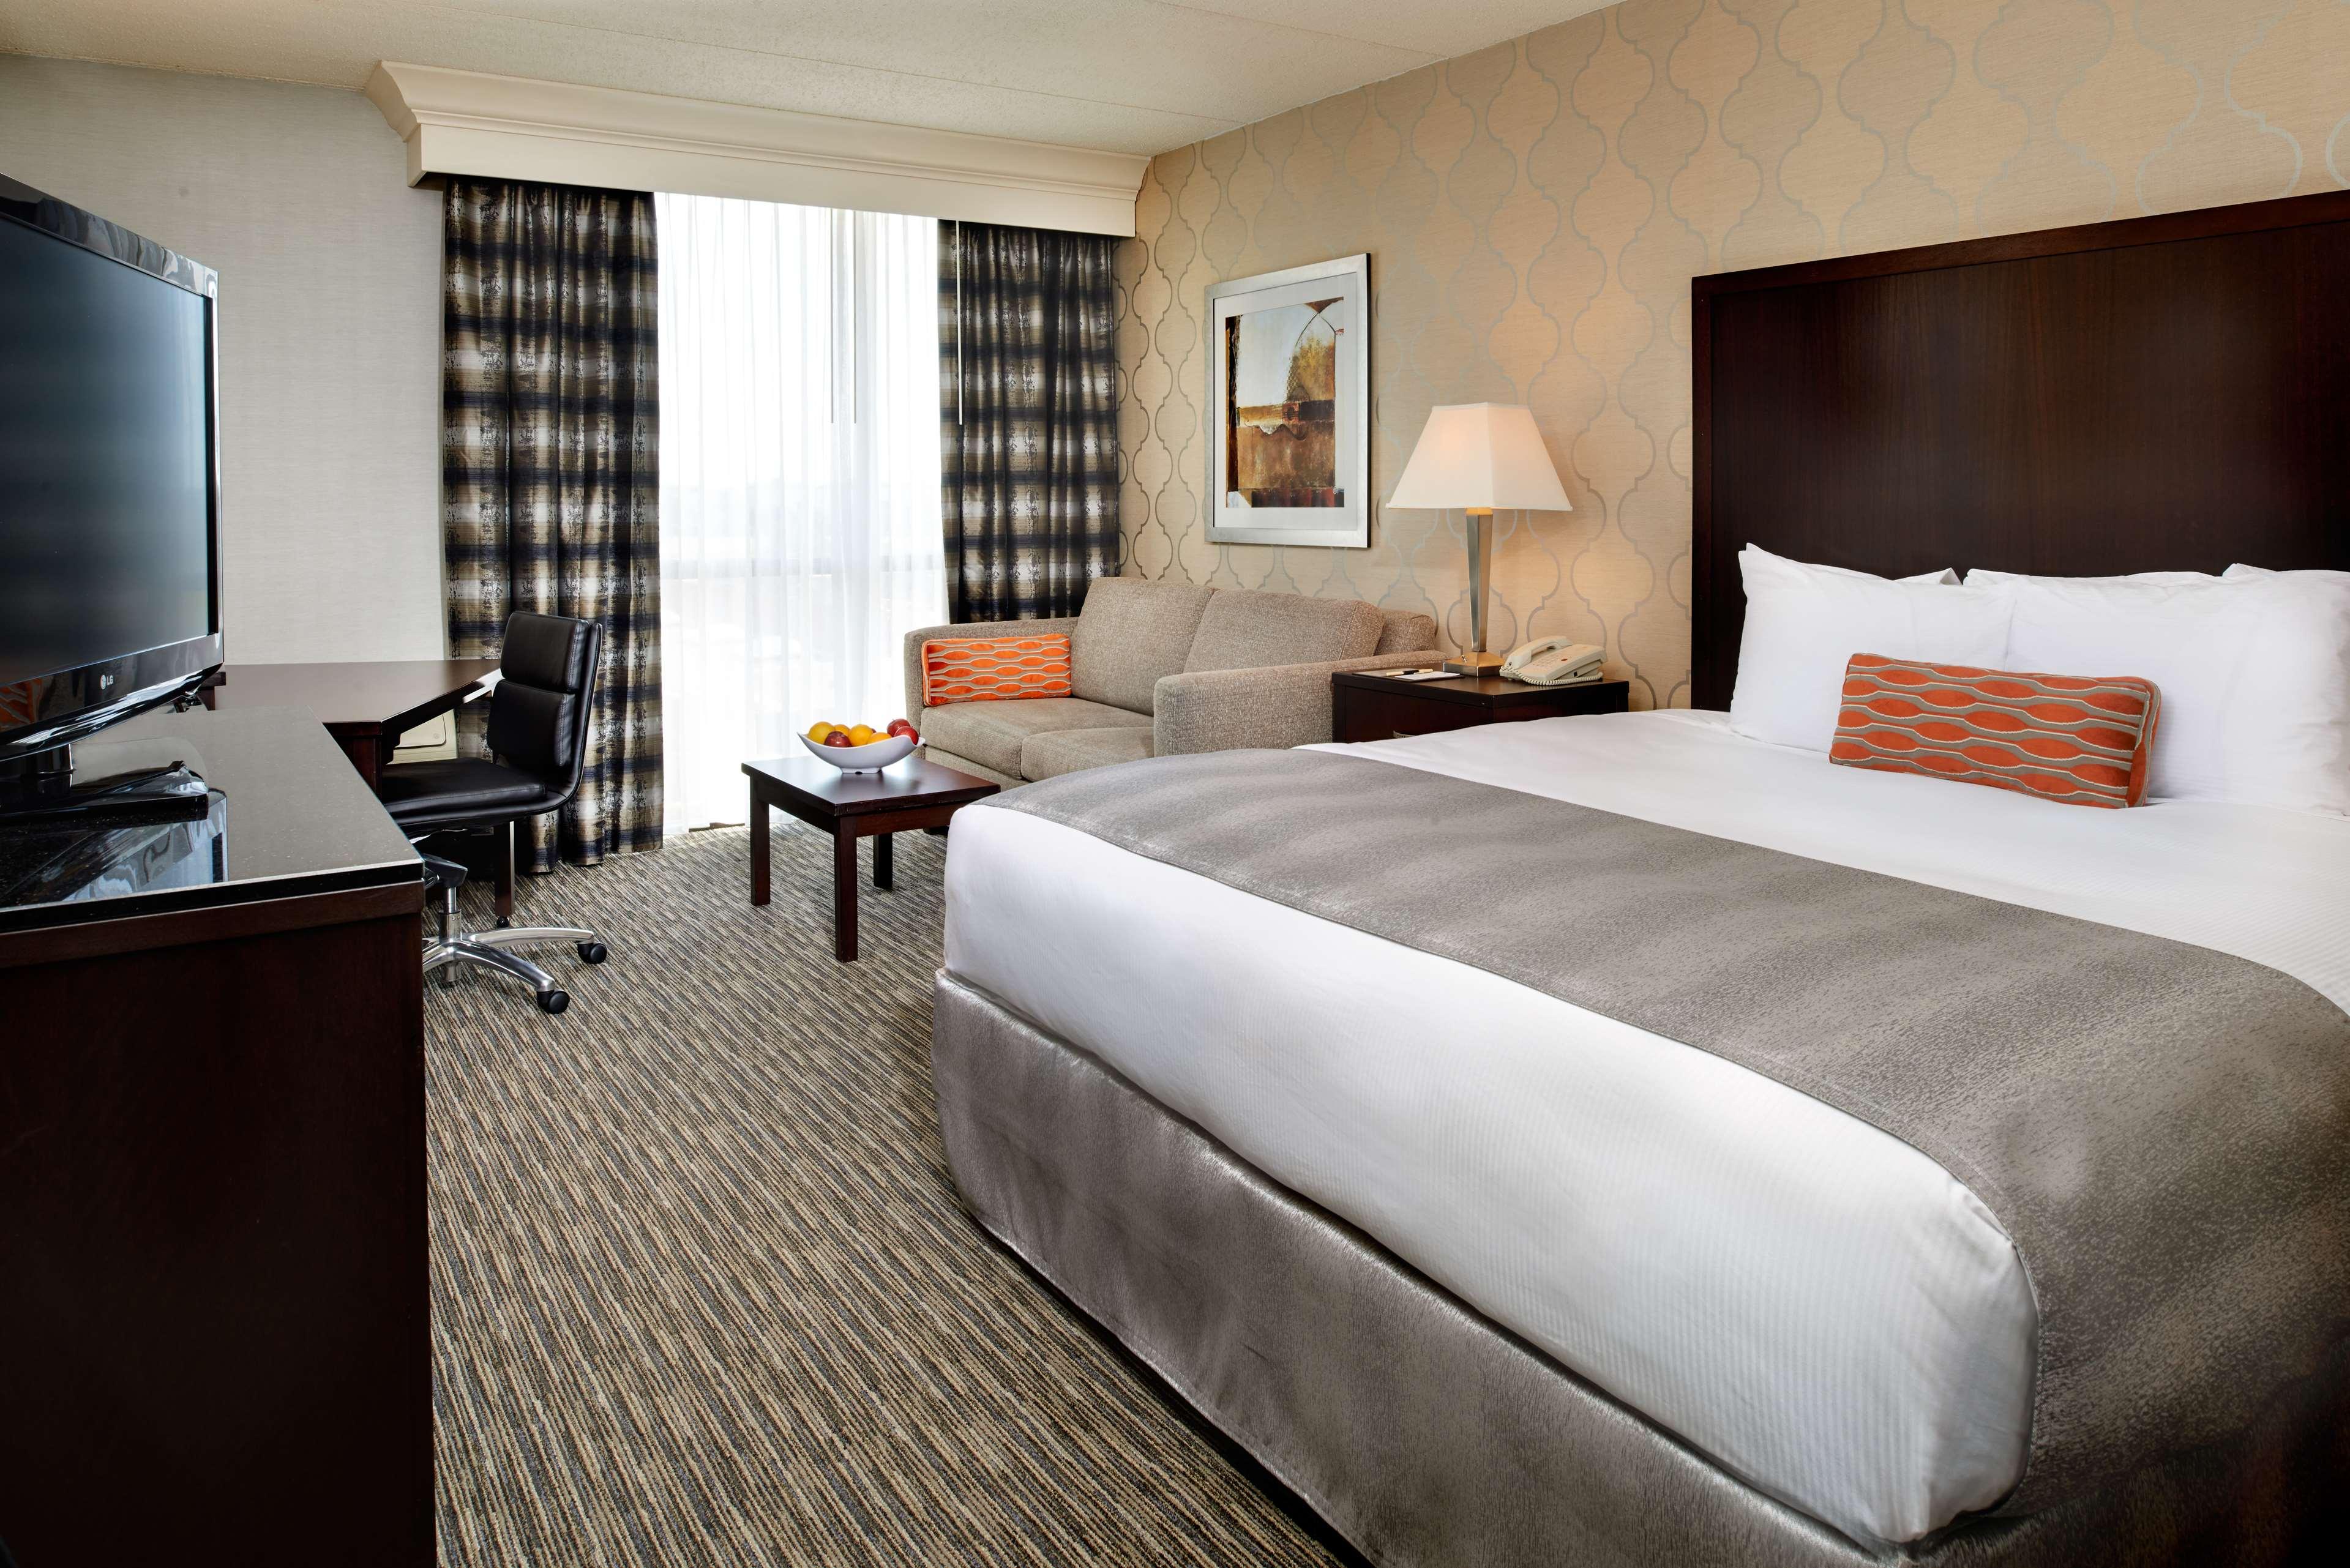 DoubleTree by Hilton Hotel Detroit - Dearborn image 17